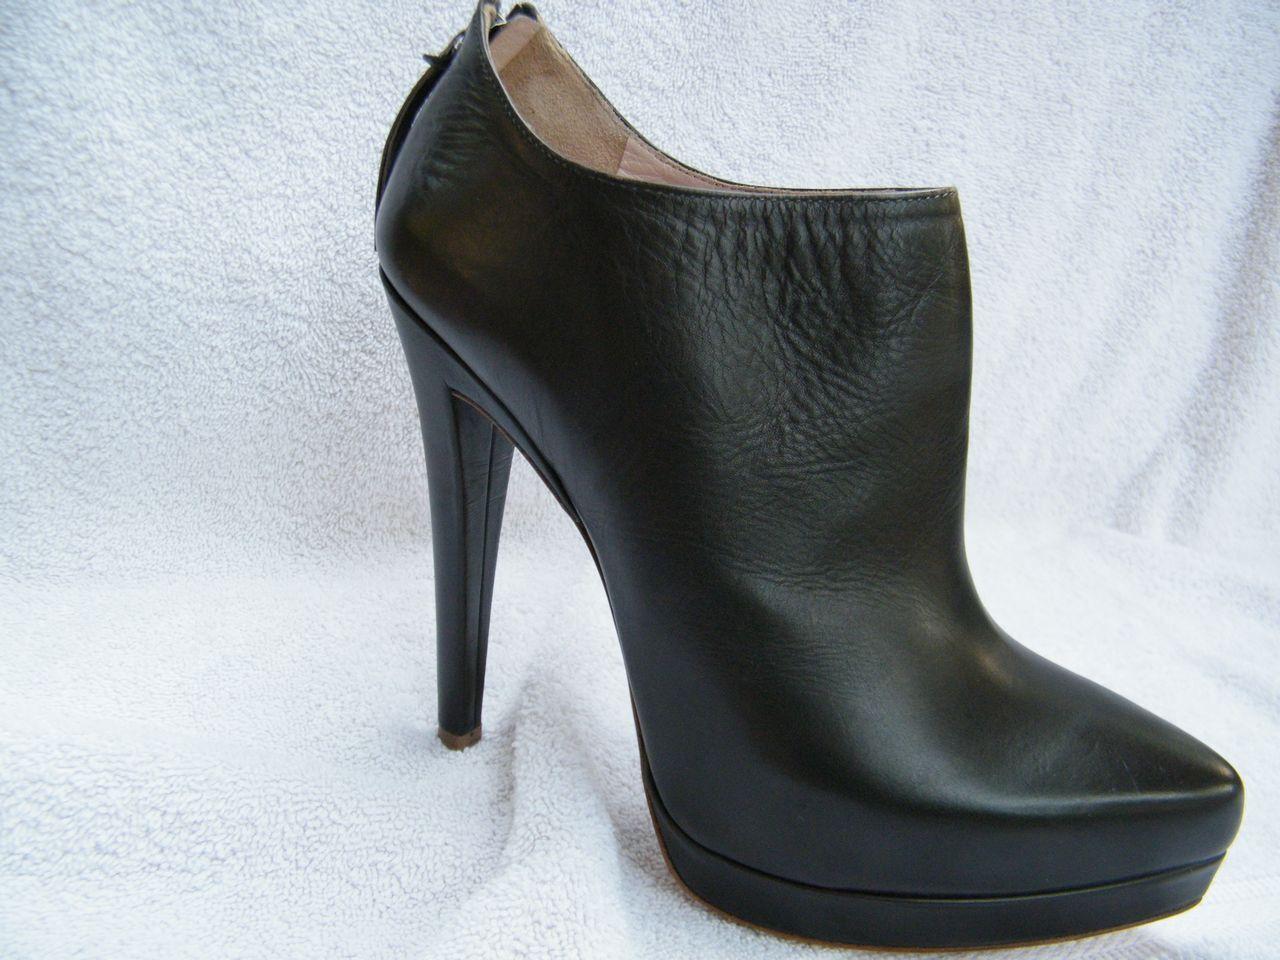 Miu Miu zapatos sandals heels botas 37 7 dark gris